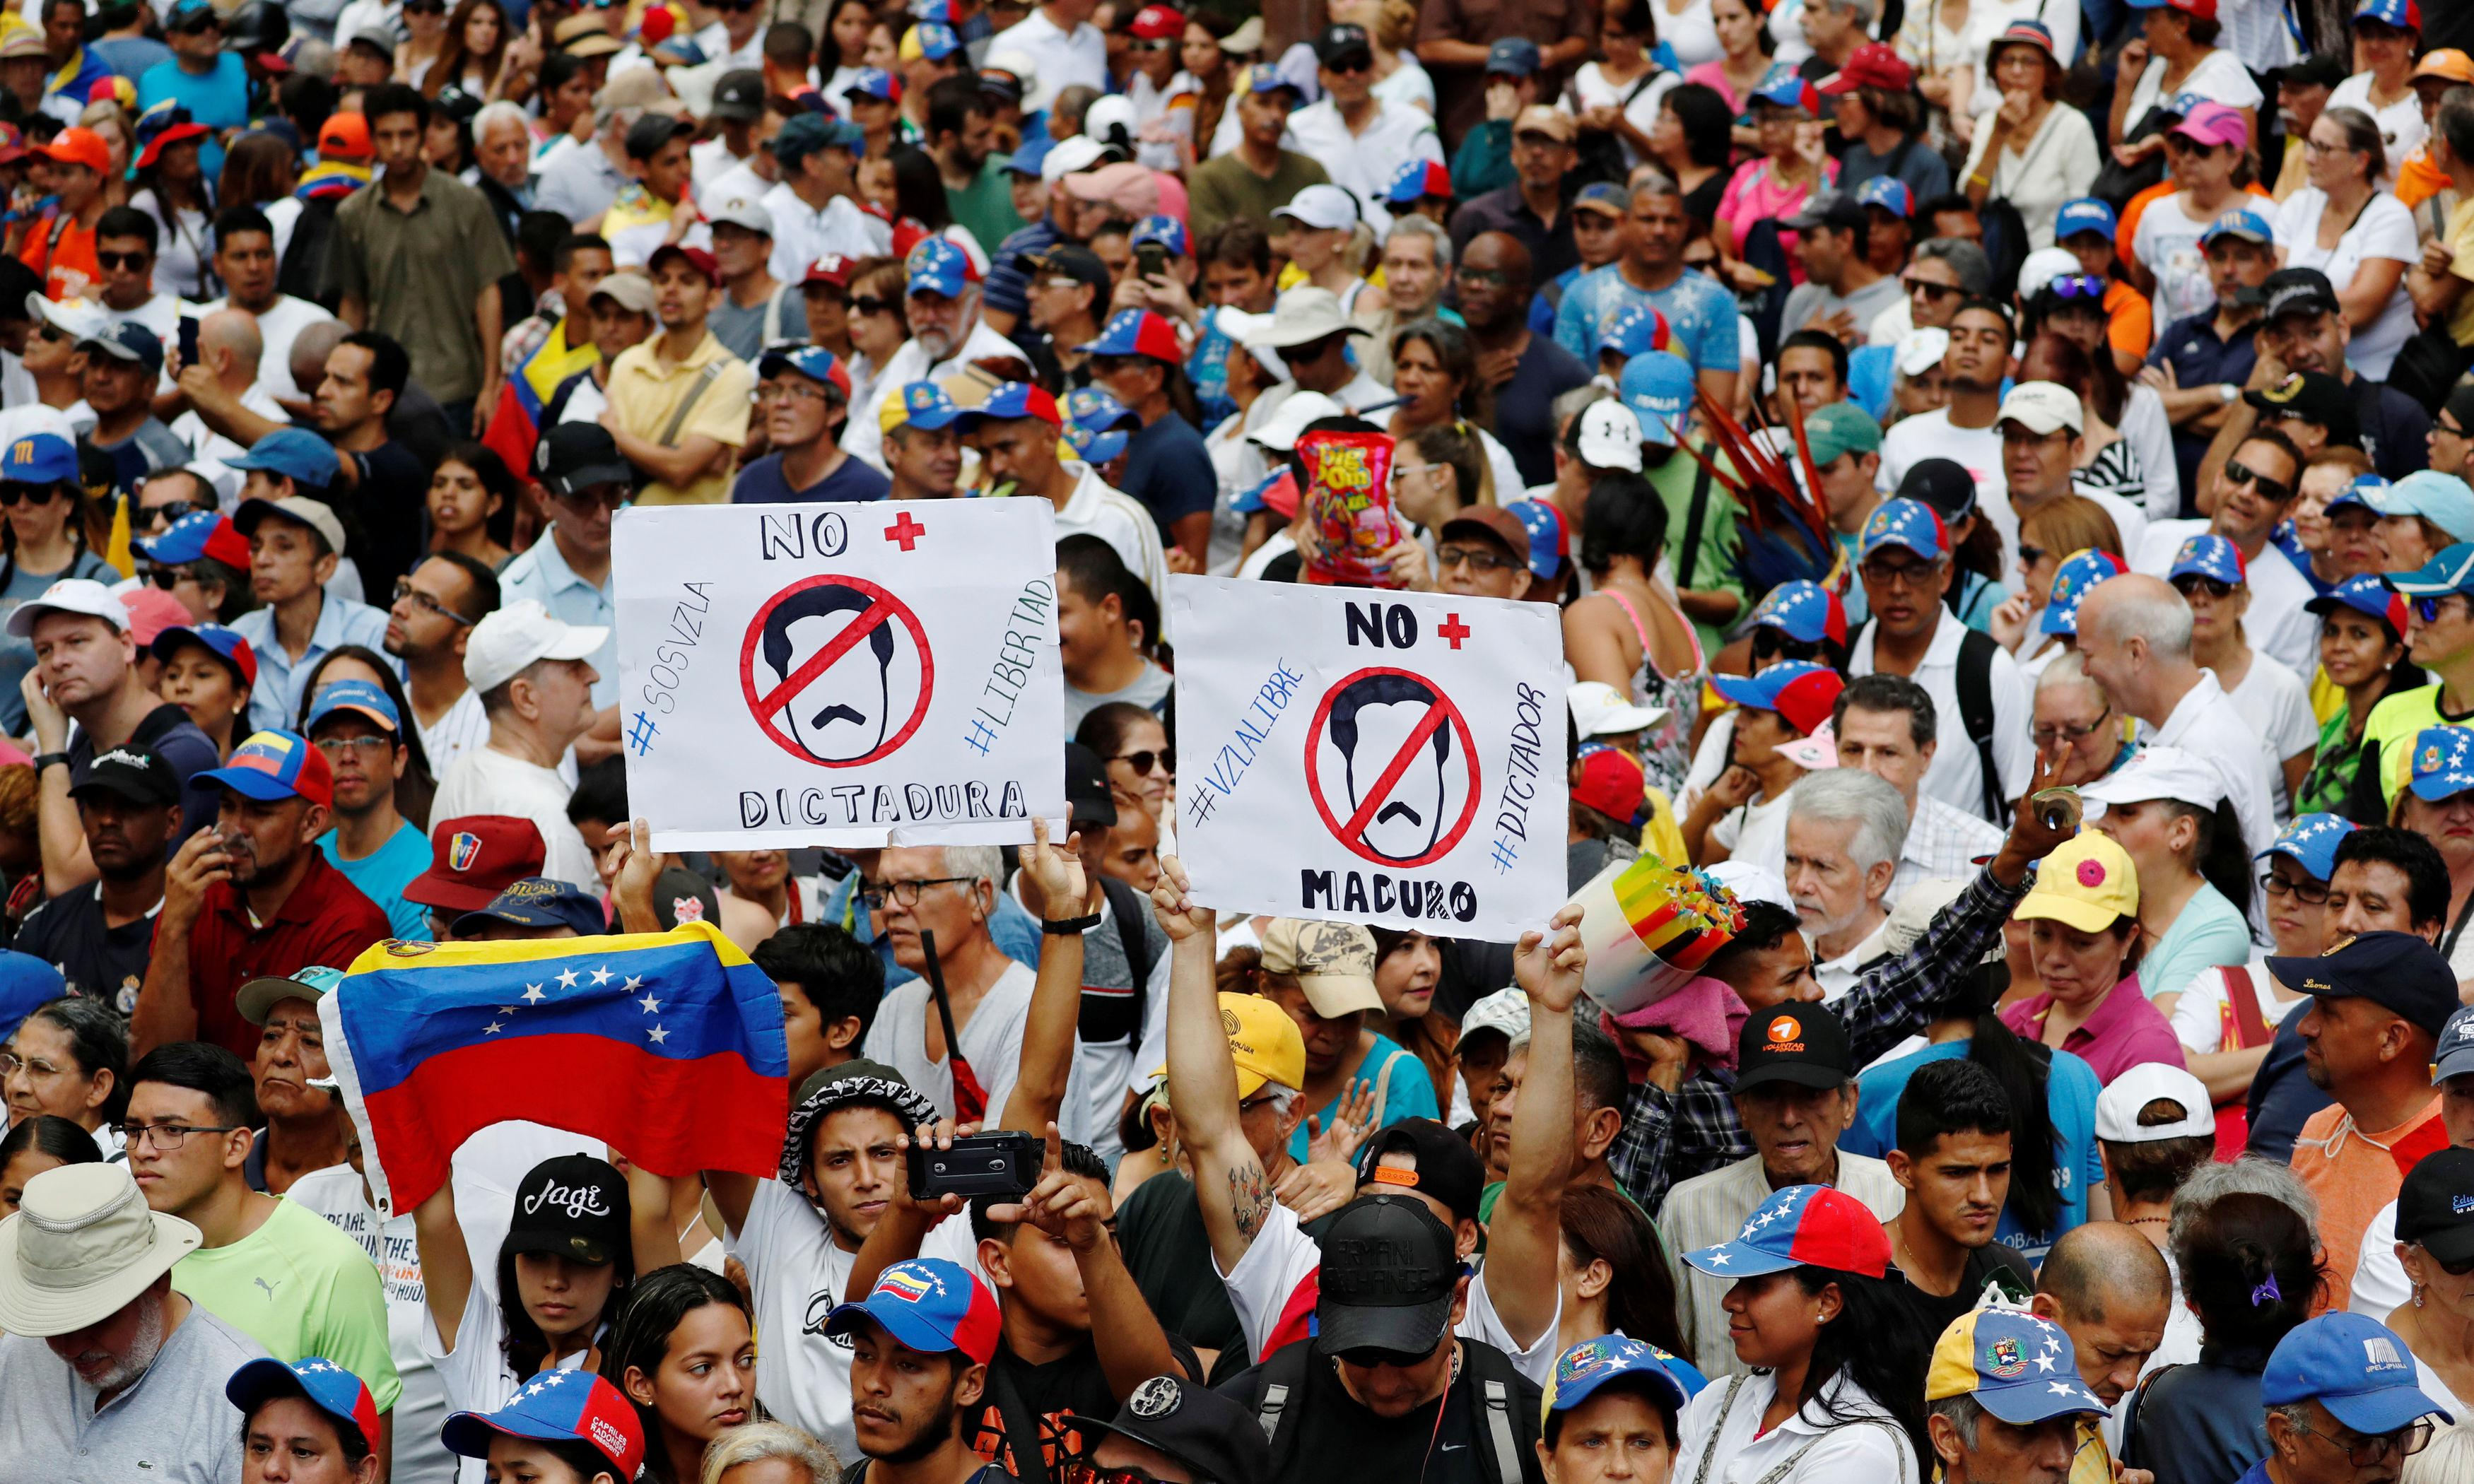 Evo Morales ousting brings new hope to Venezuela's flagging opposition